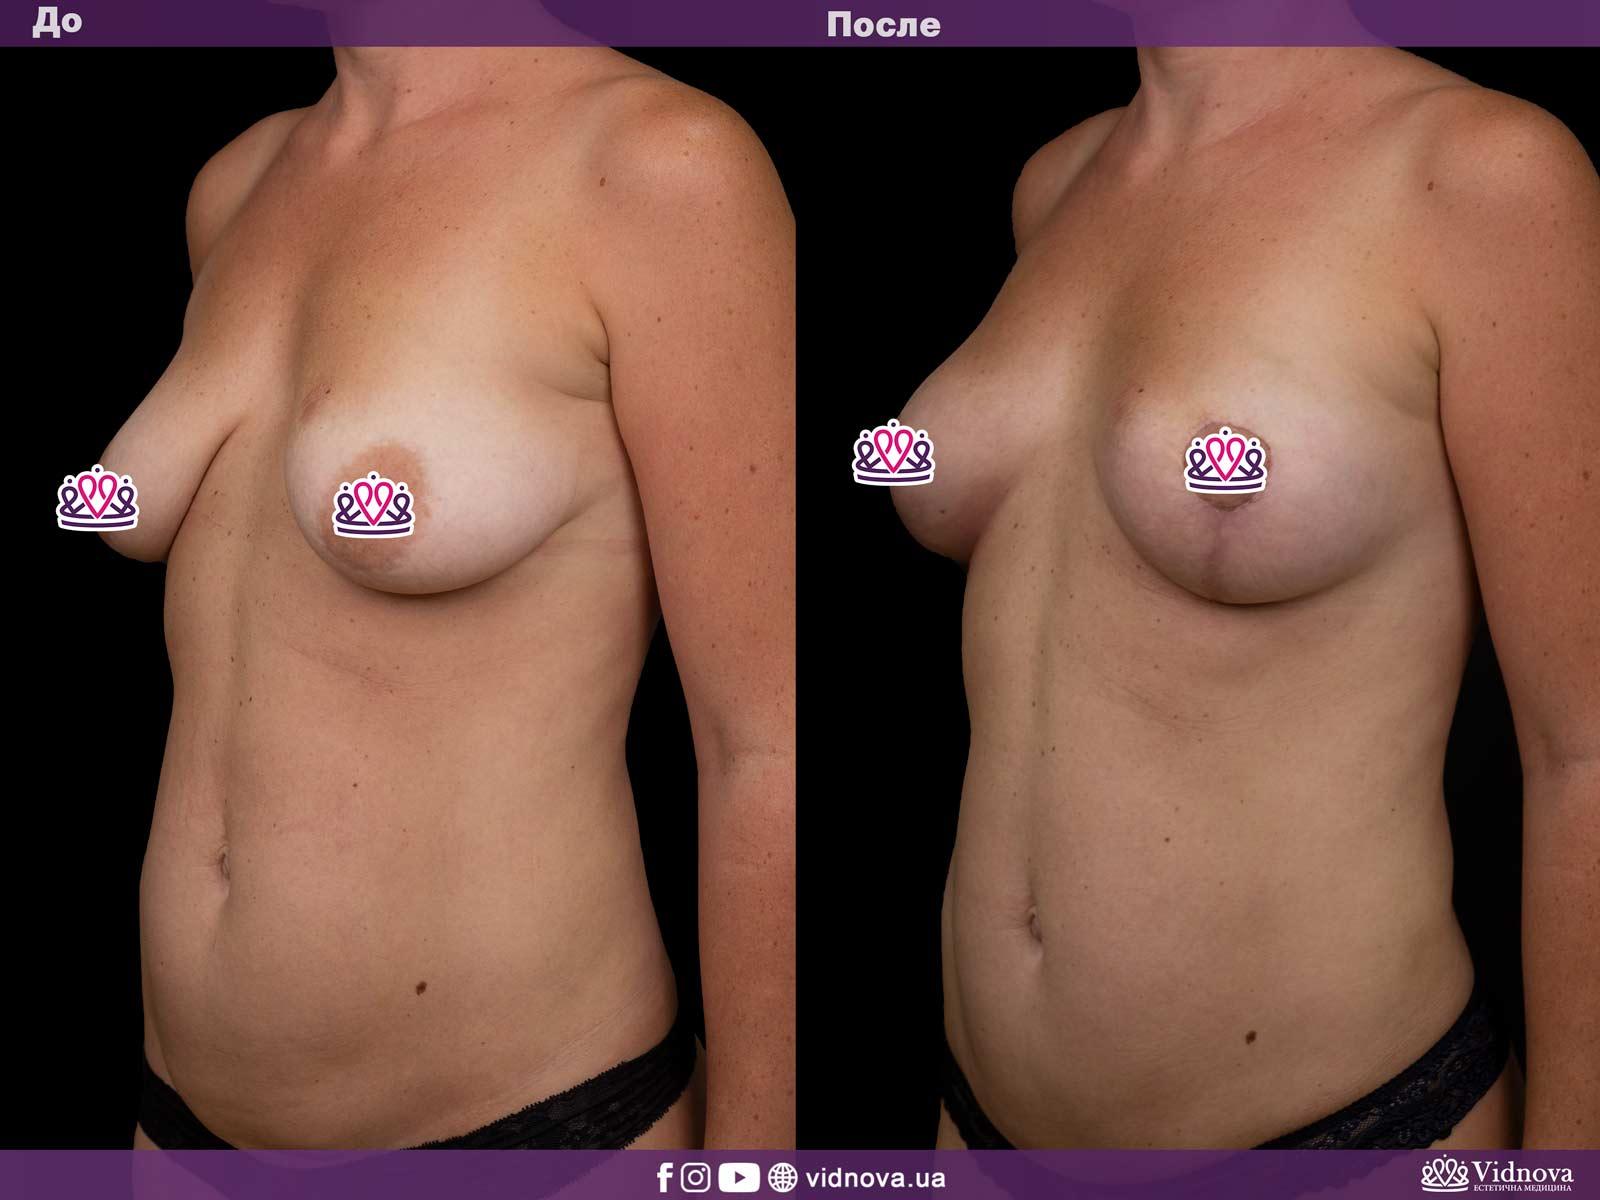 Подтяжка груди: Фото ДО и ПОСЛЕ - Пример №12-2 - Клиника Vidnova